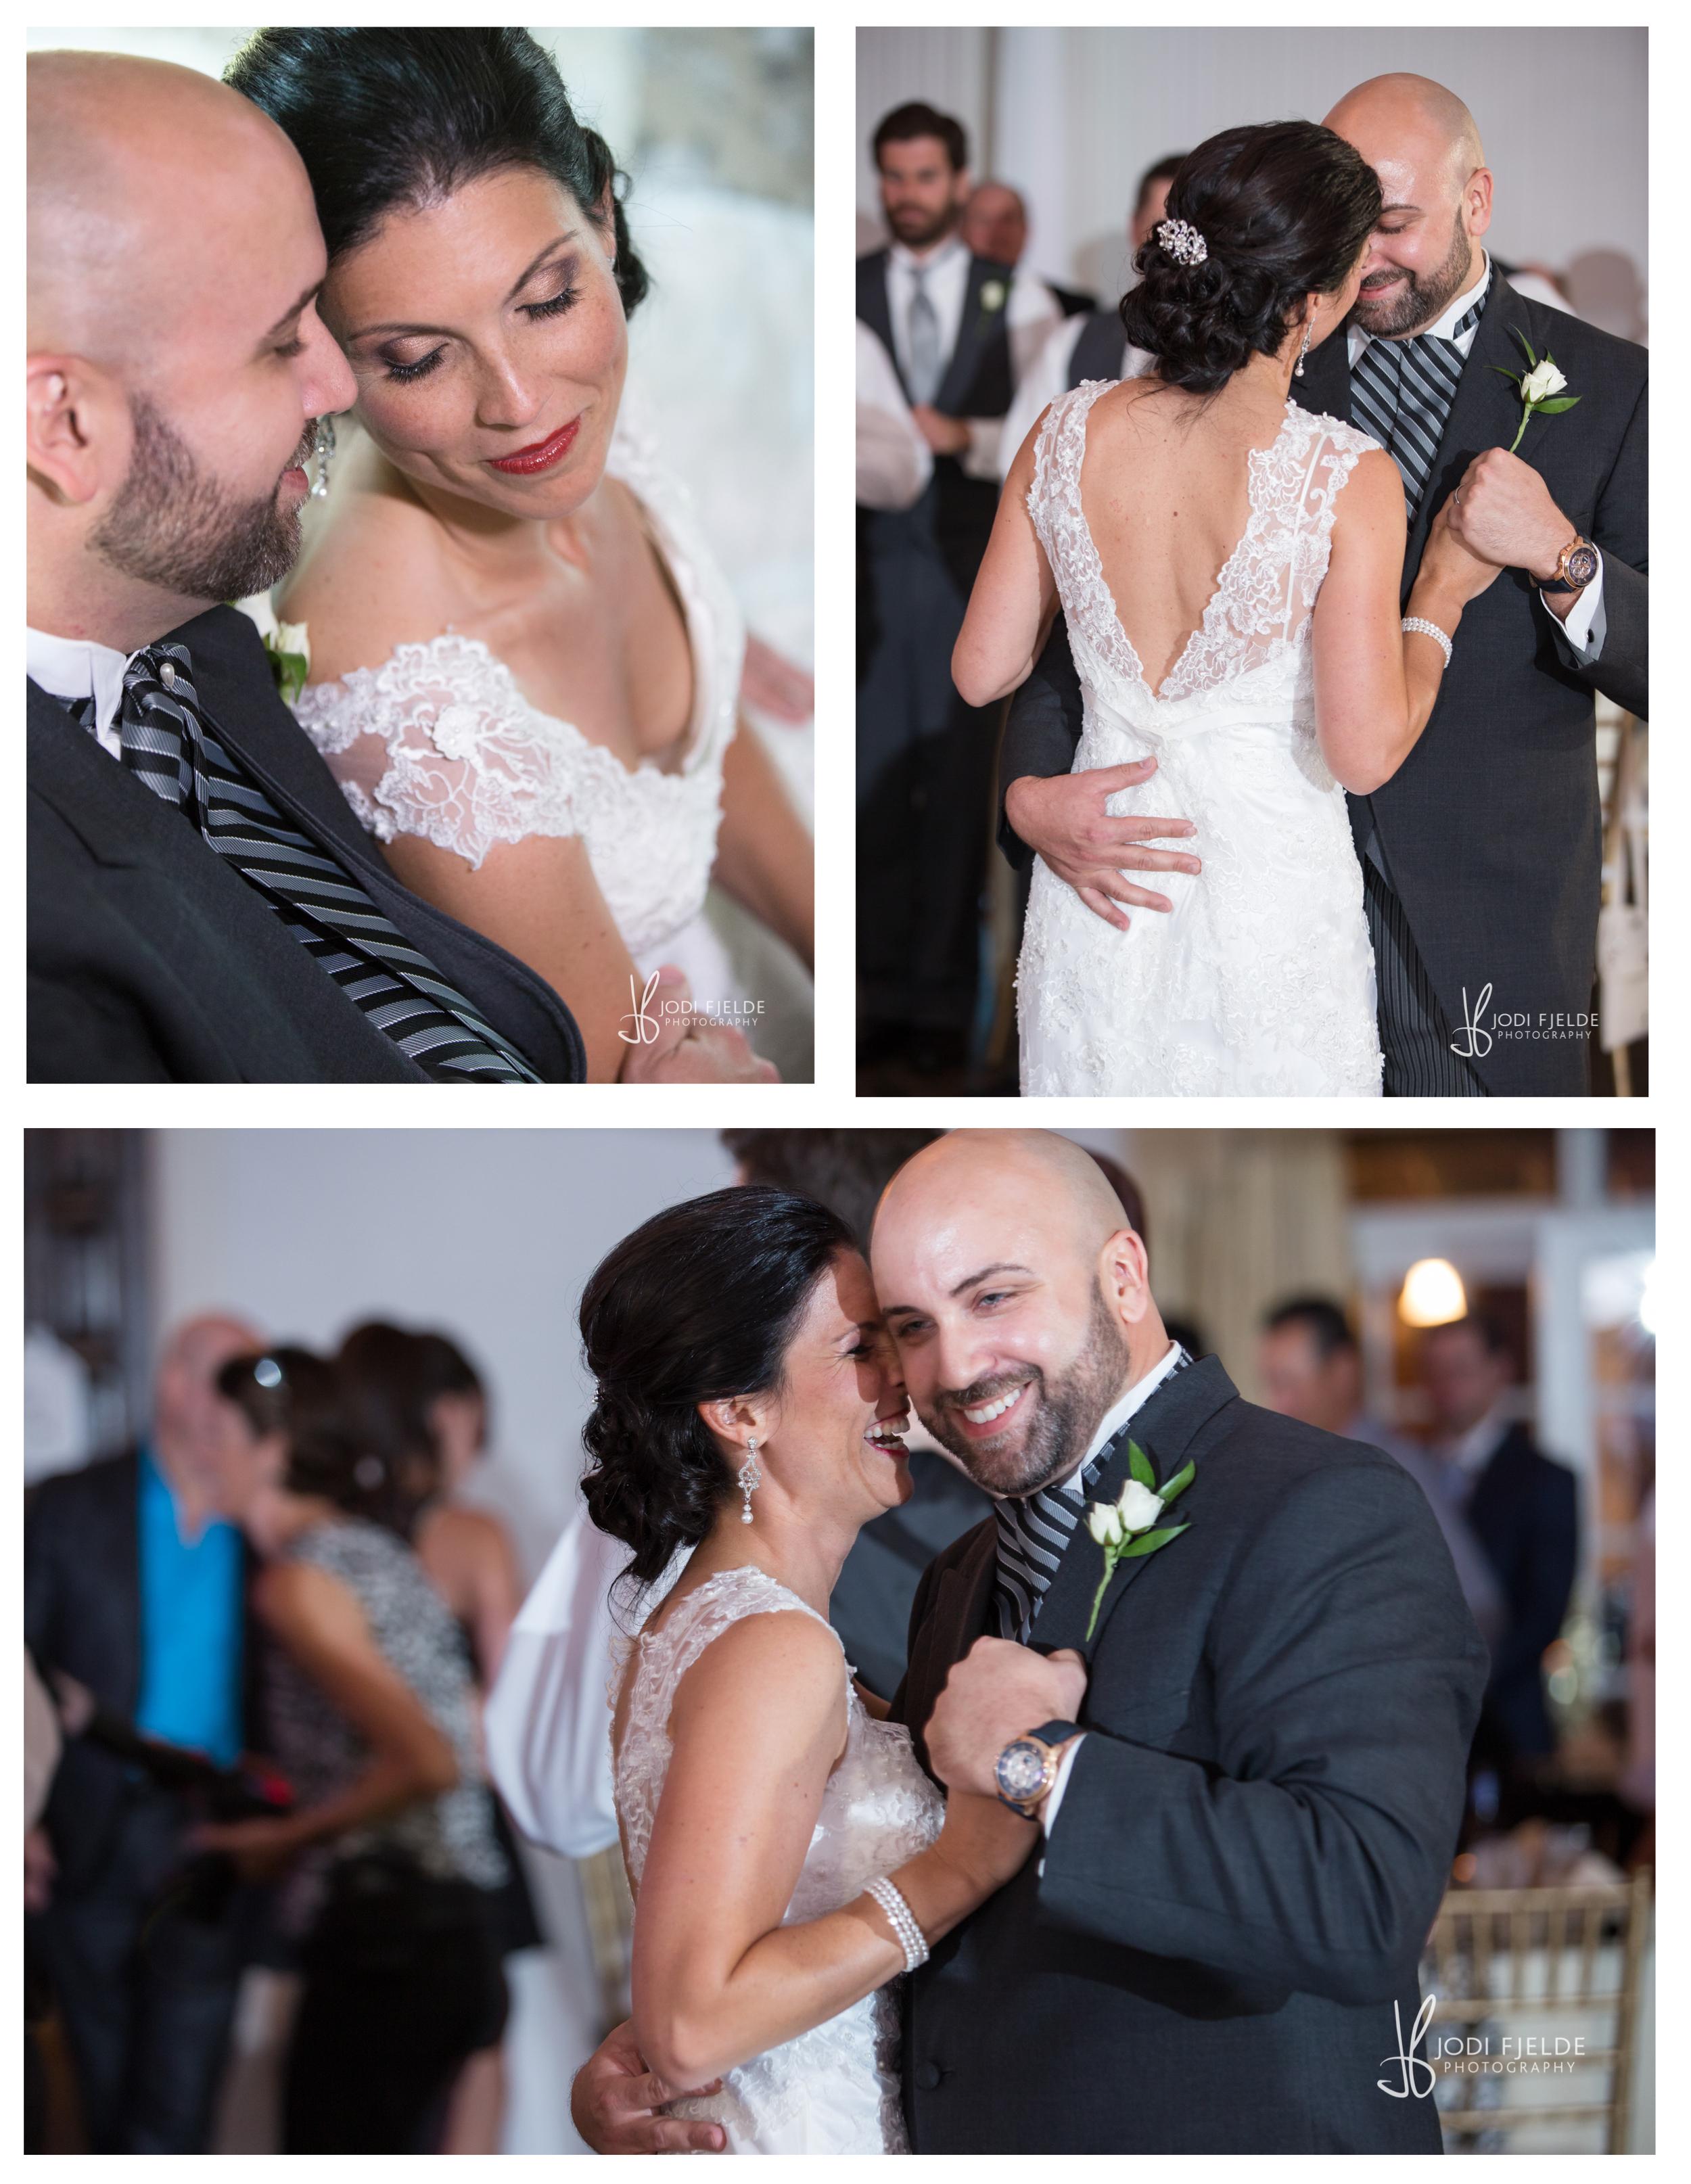 Highland_Manor_Apopka_Florida_wedding_Jackie_&_Tim_photography_jodi_Fjelde_photography-28.jpg